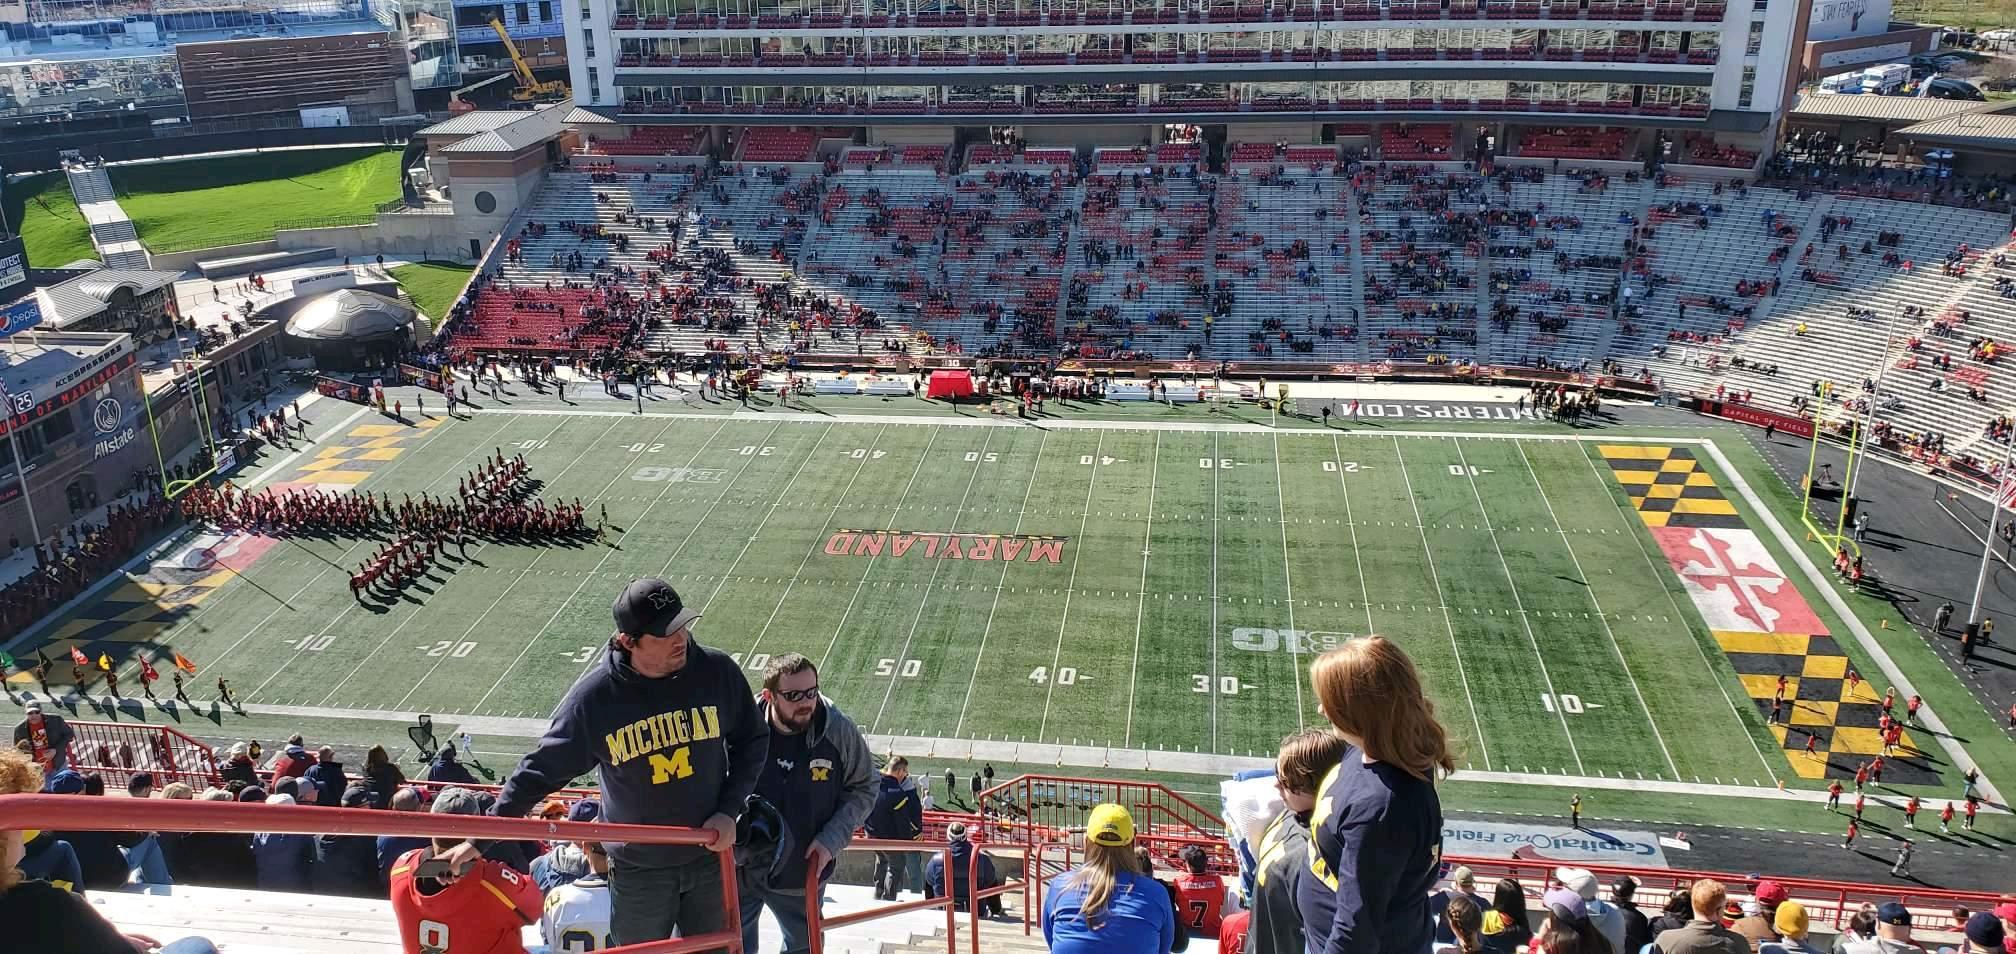 Maryland Stadium Section 308 Row Z Seat 2